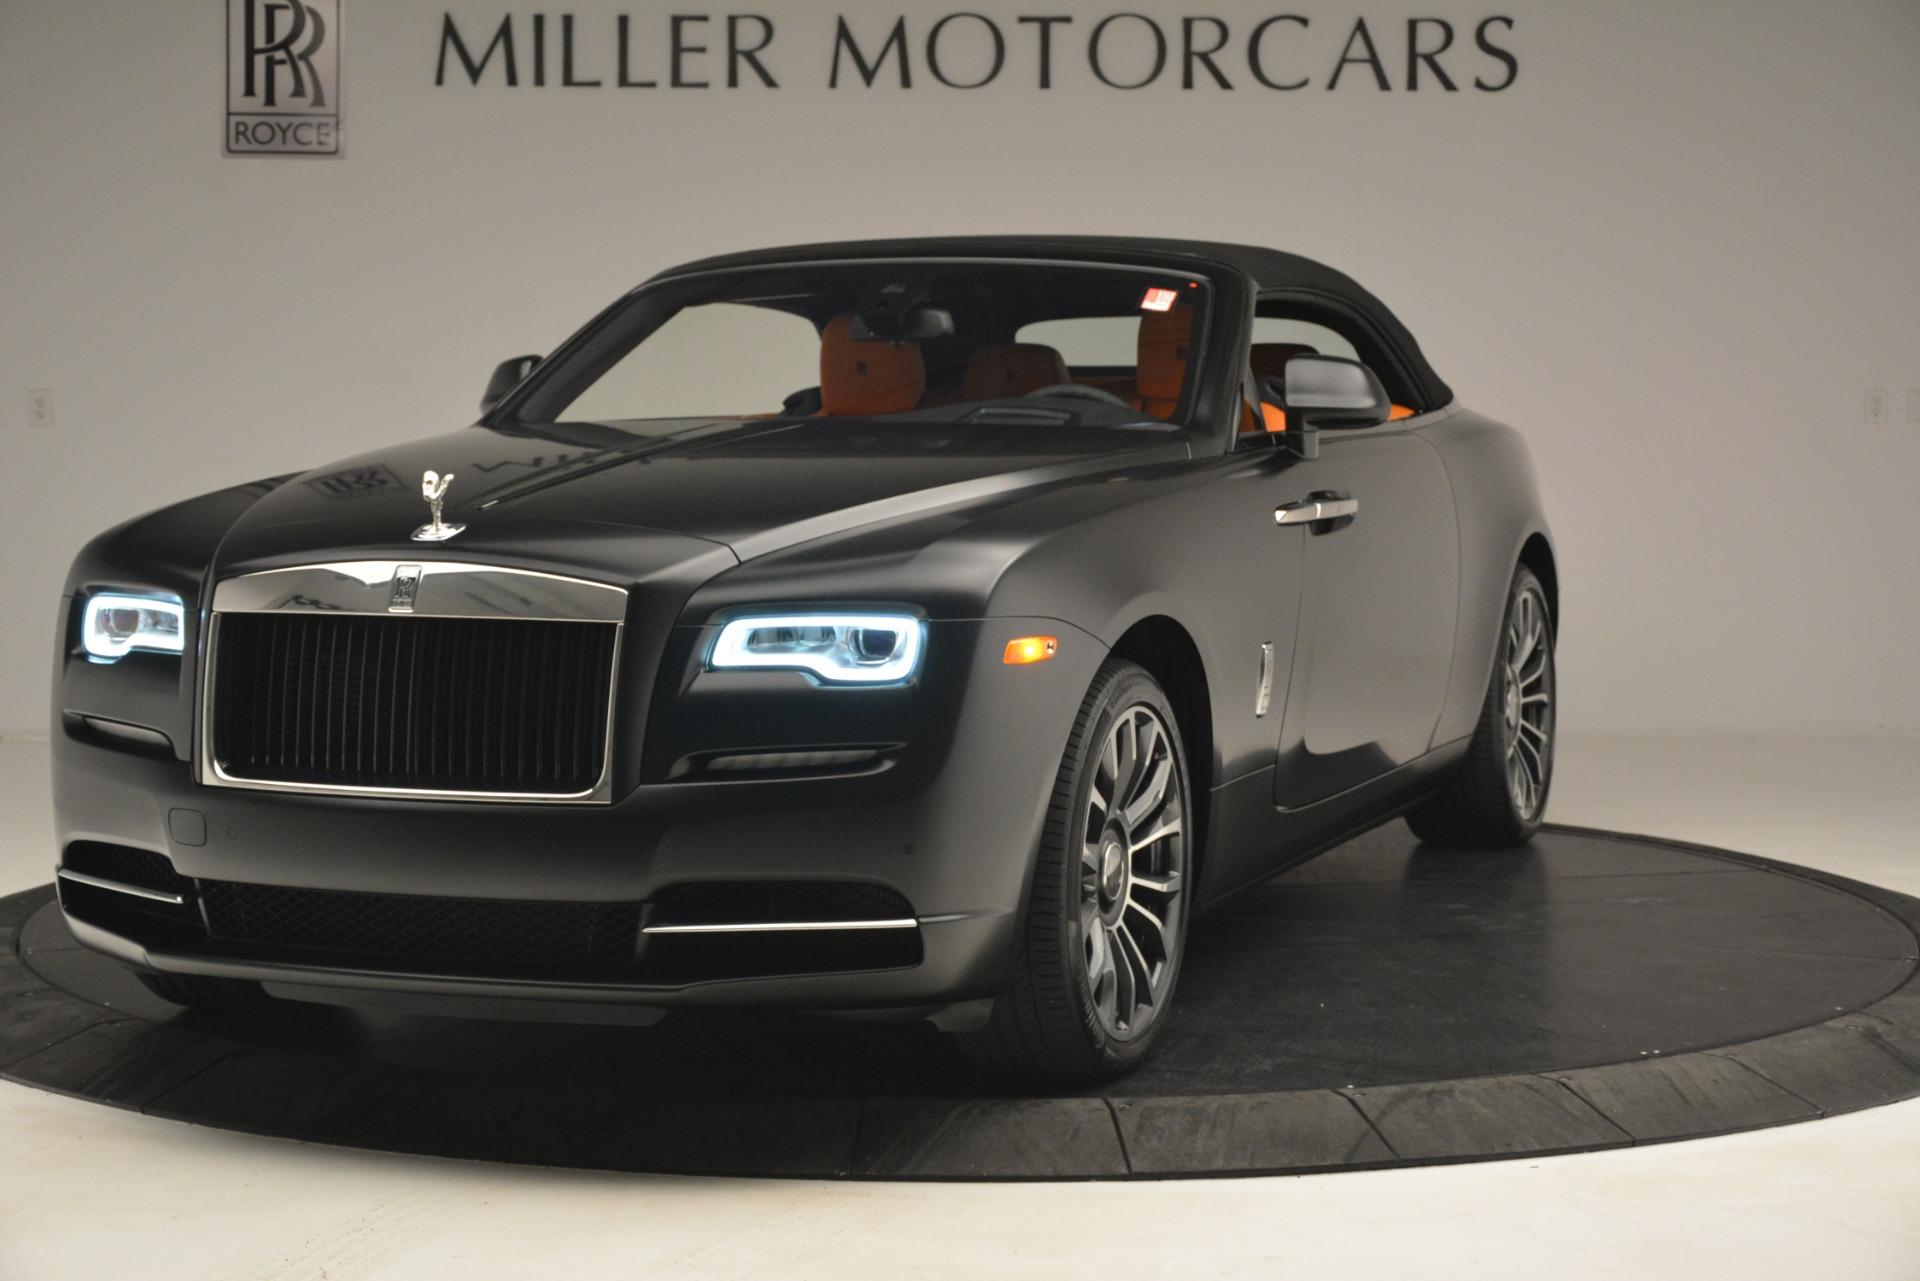 New 2019 Rolls-Royce Dawn  For Sale In Greenwich, CT 2695_p14